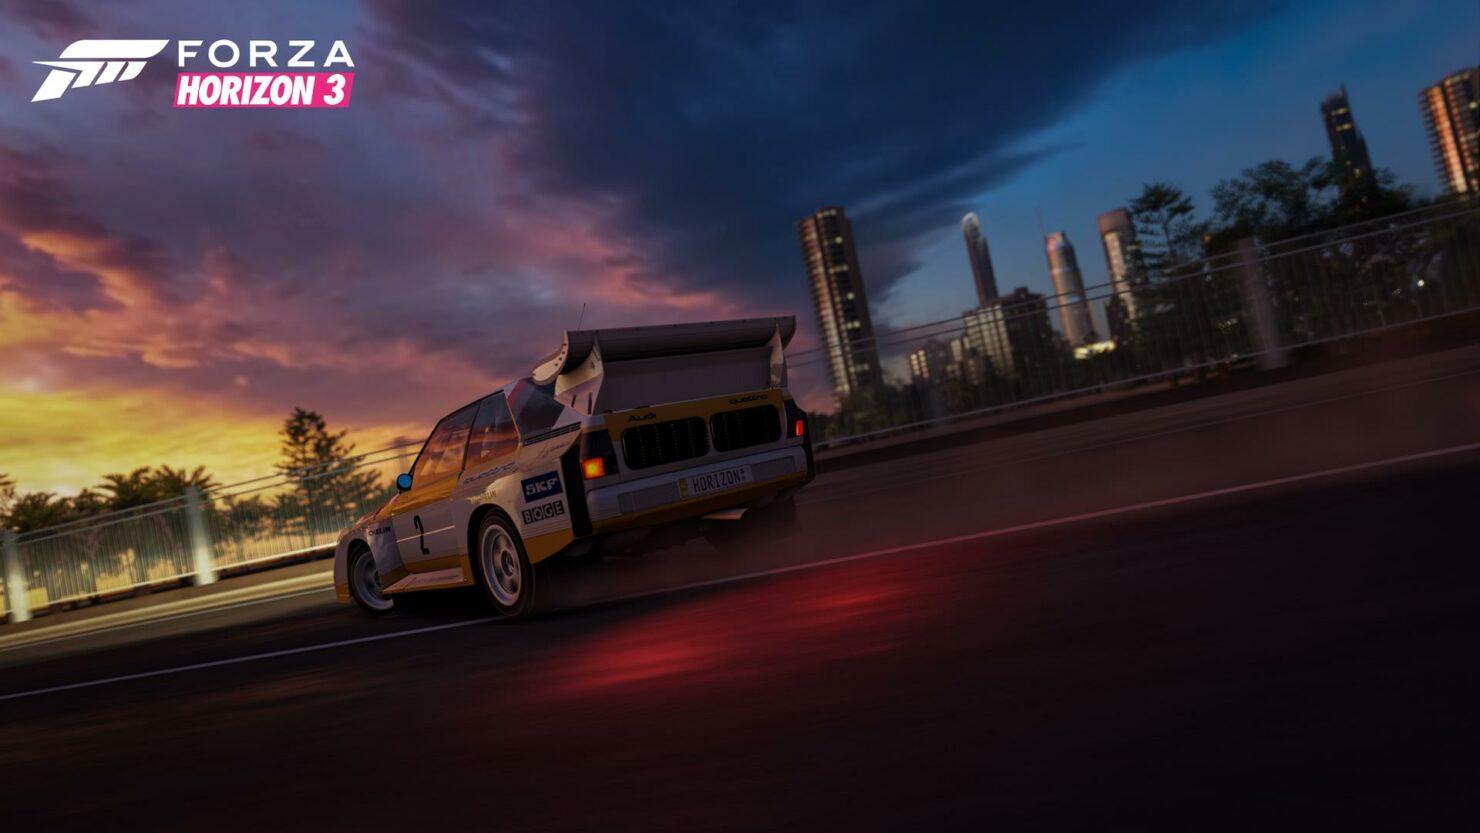 forza-horizon-3-gamescom-02-cityscape